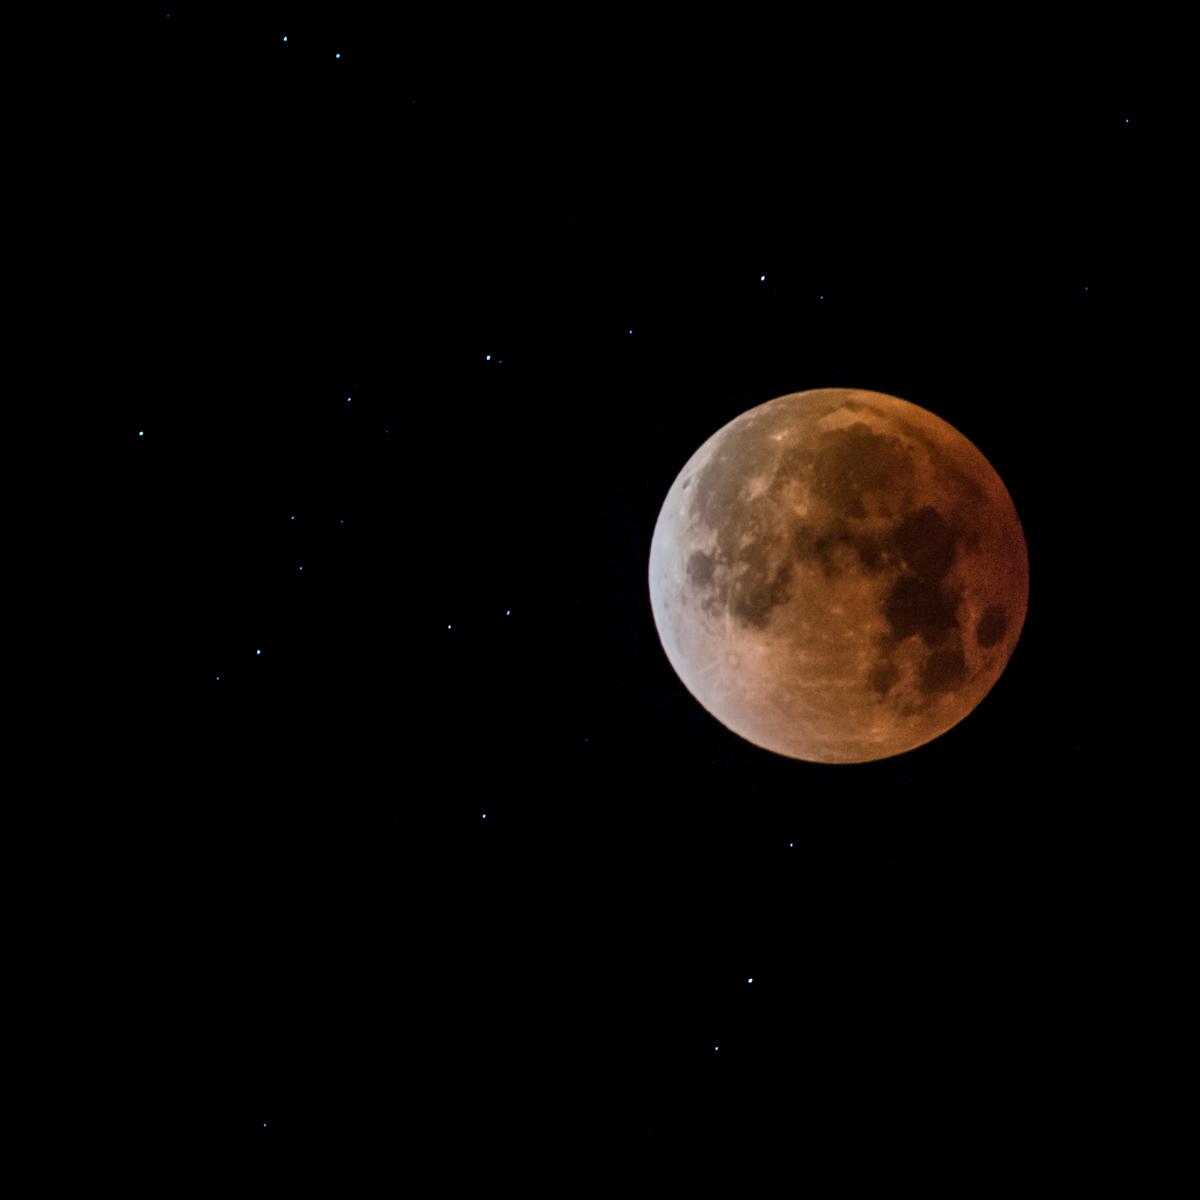 Photo of the January 31, 2018 lunar eclipse taken by Patrick Bremser  © Patrick Bremser Photography